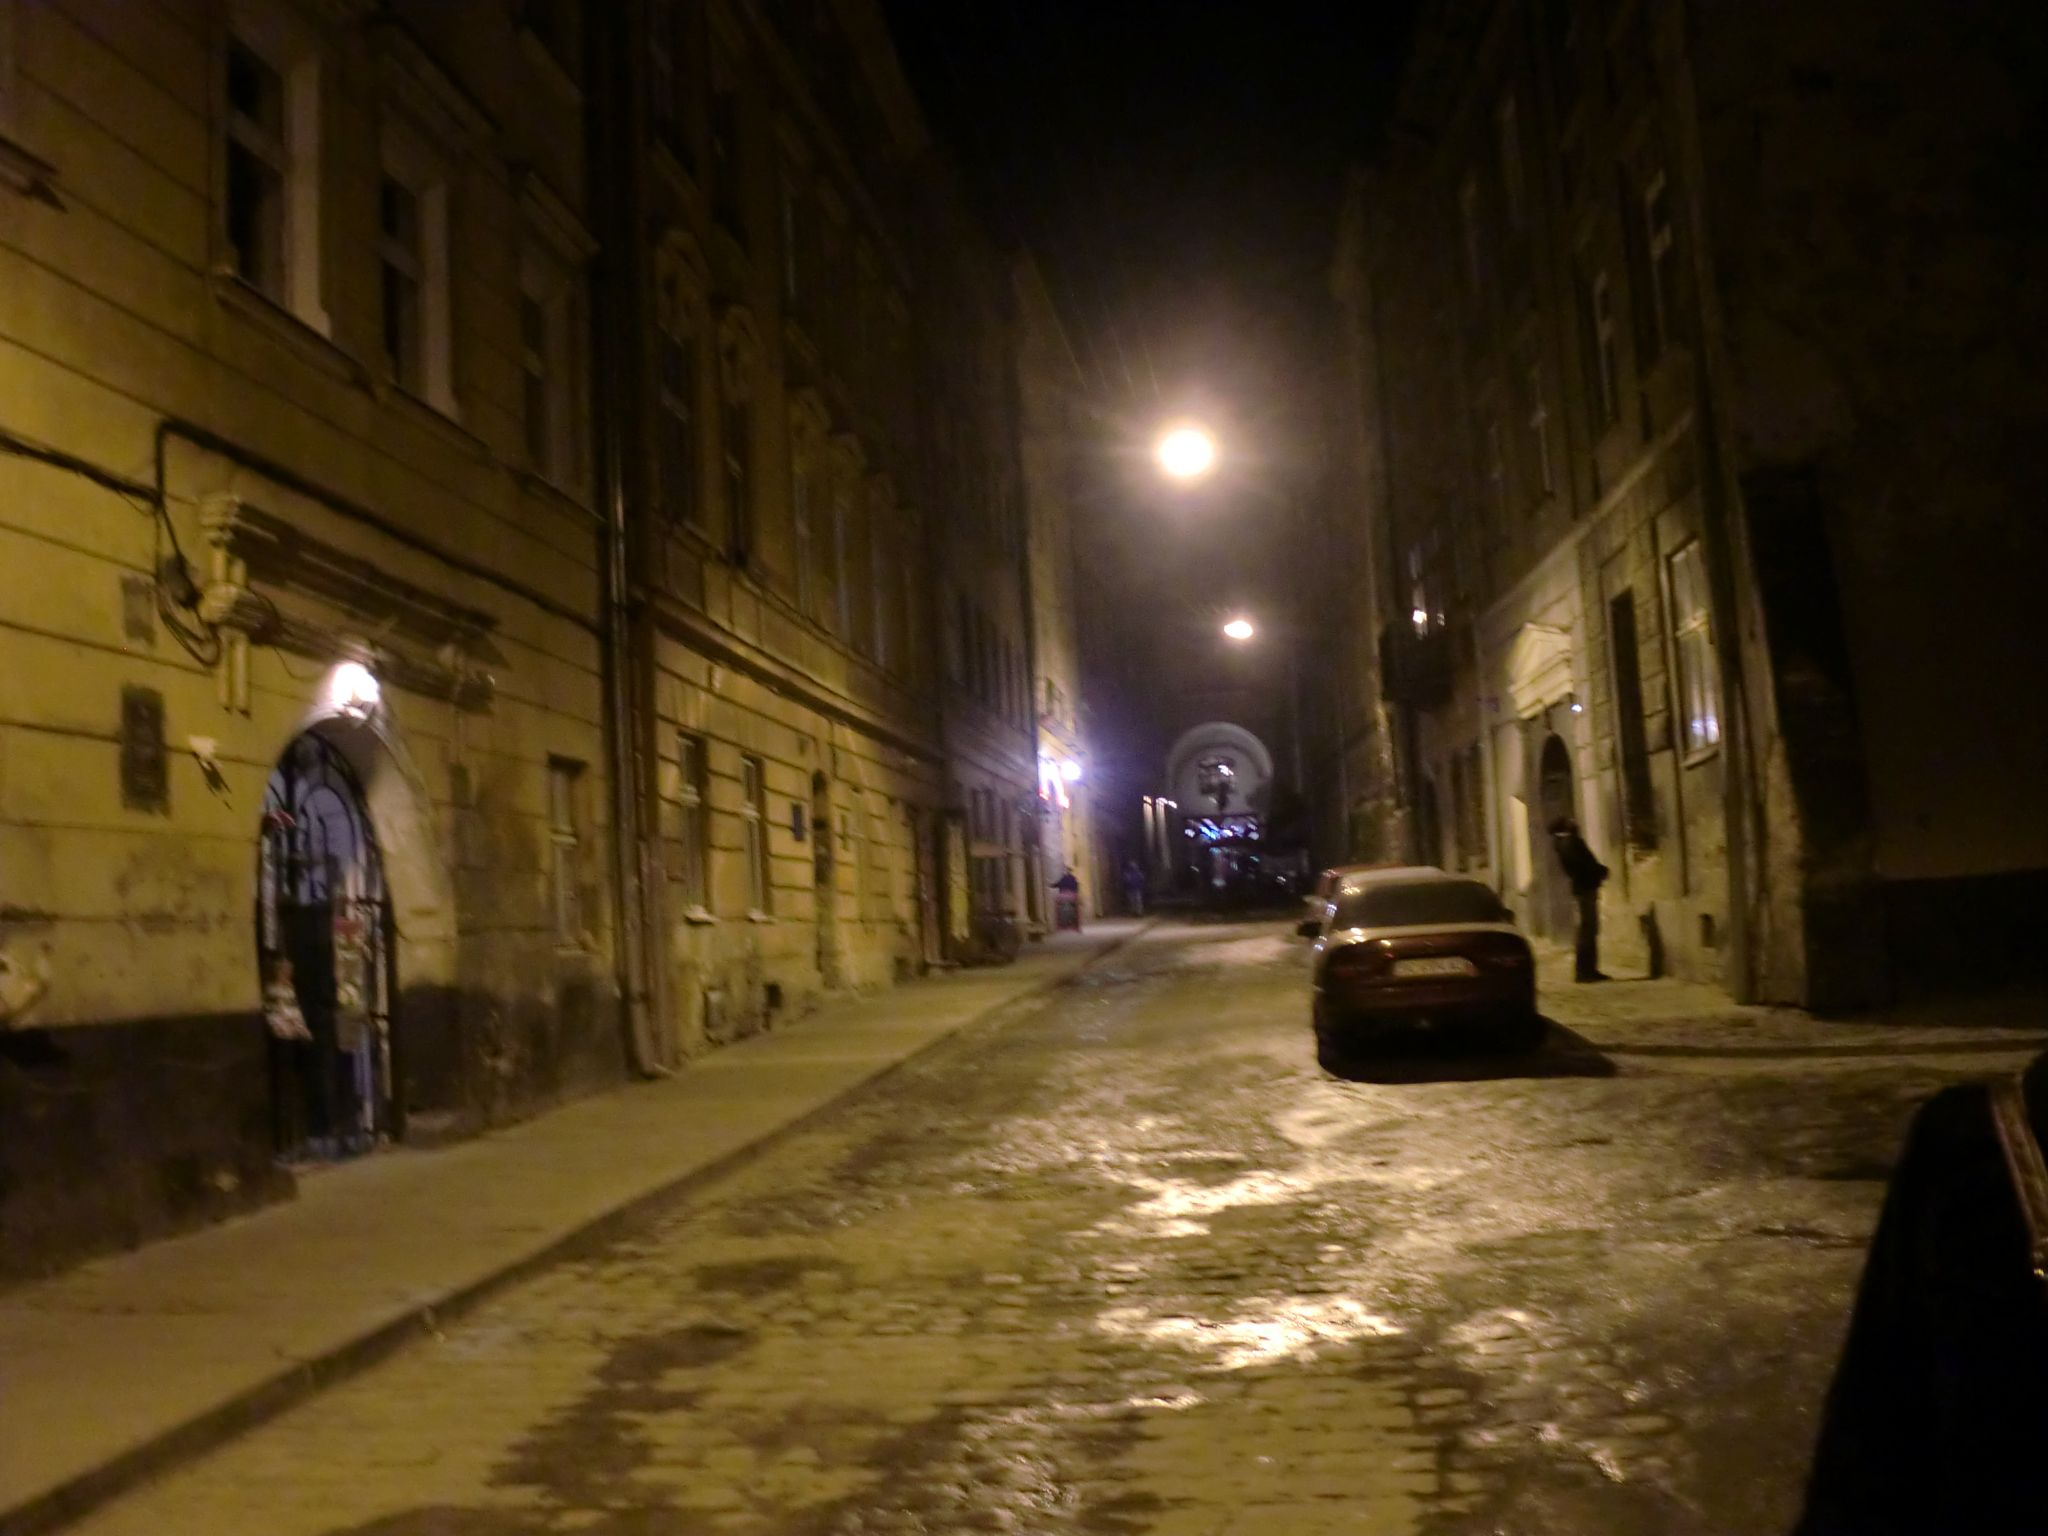 Lviv 4 - Lviv, the Ukrainian pearl